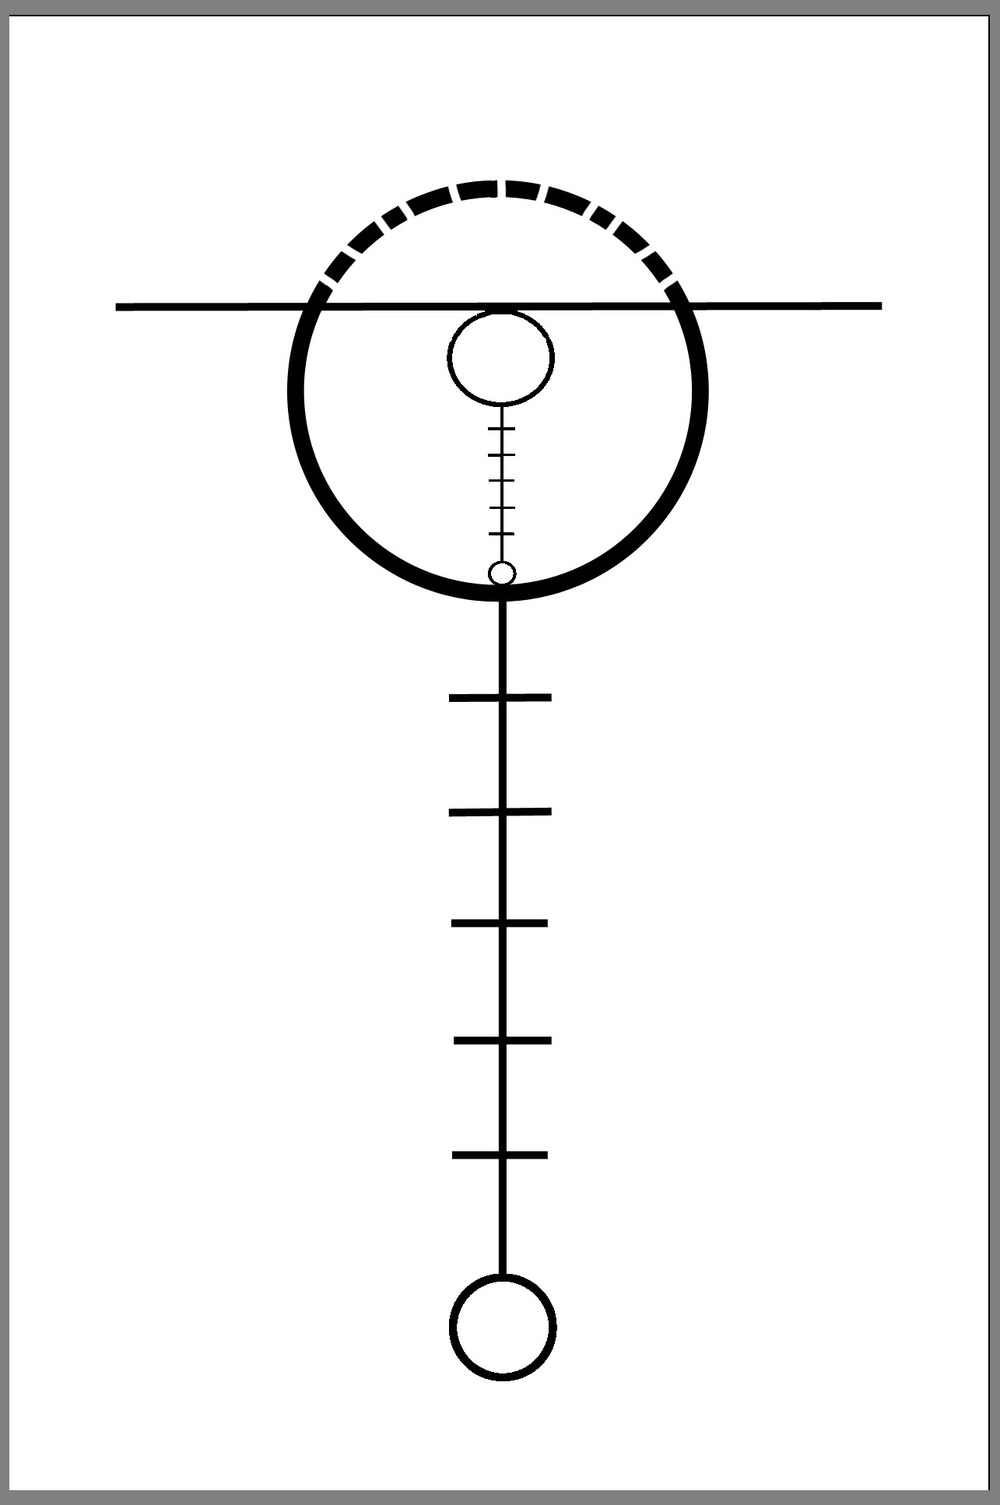 002B illust.jpg